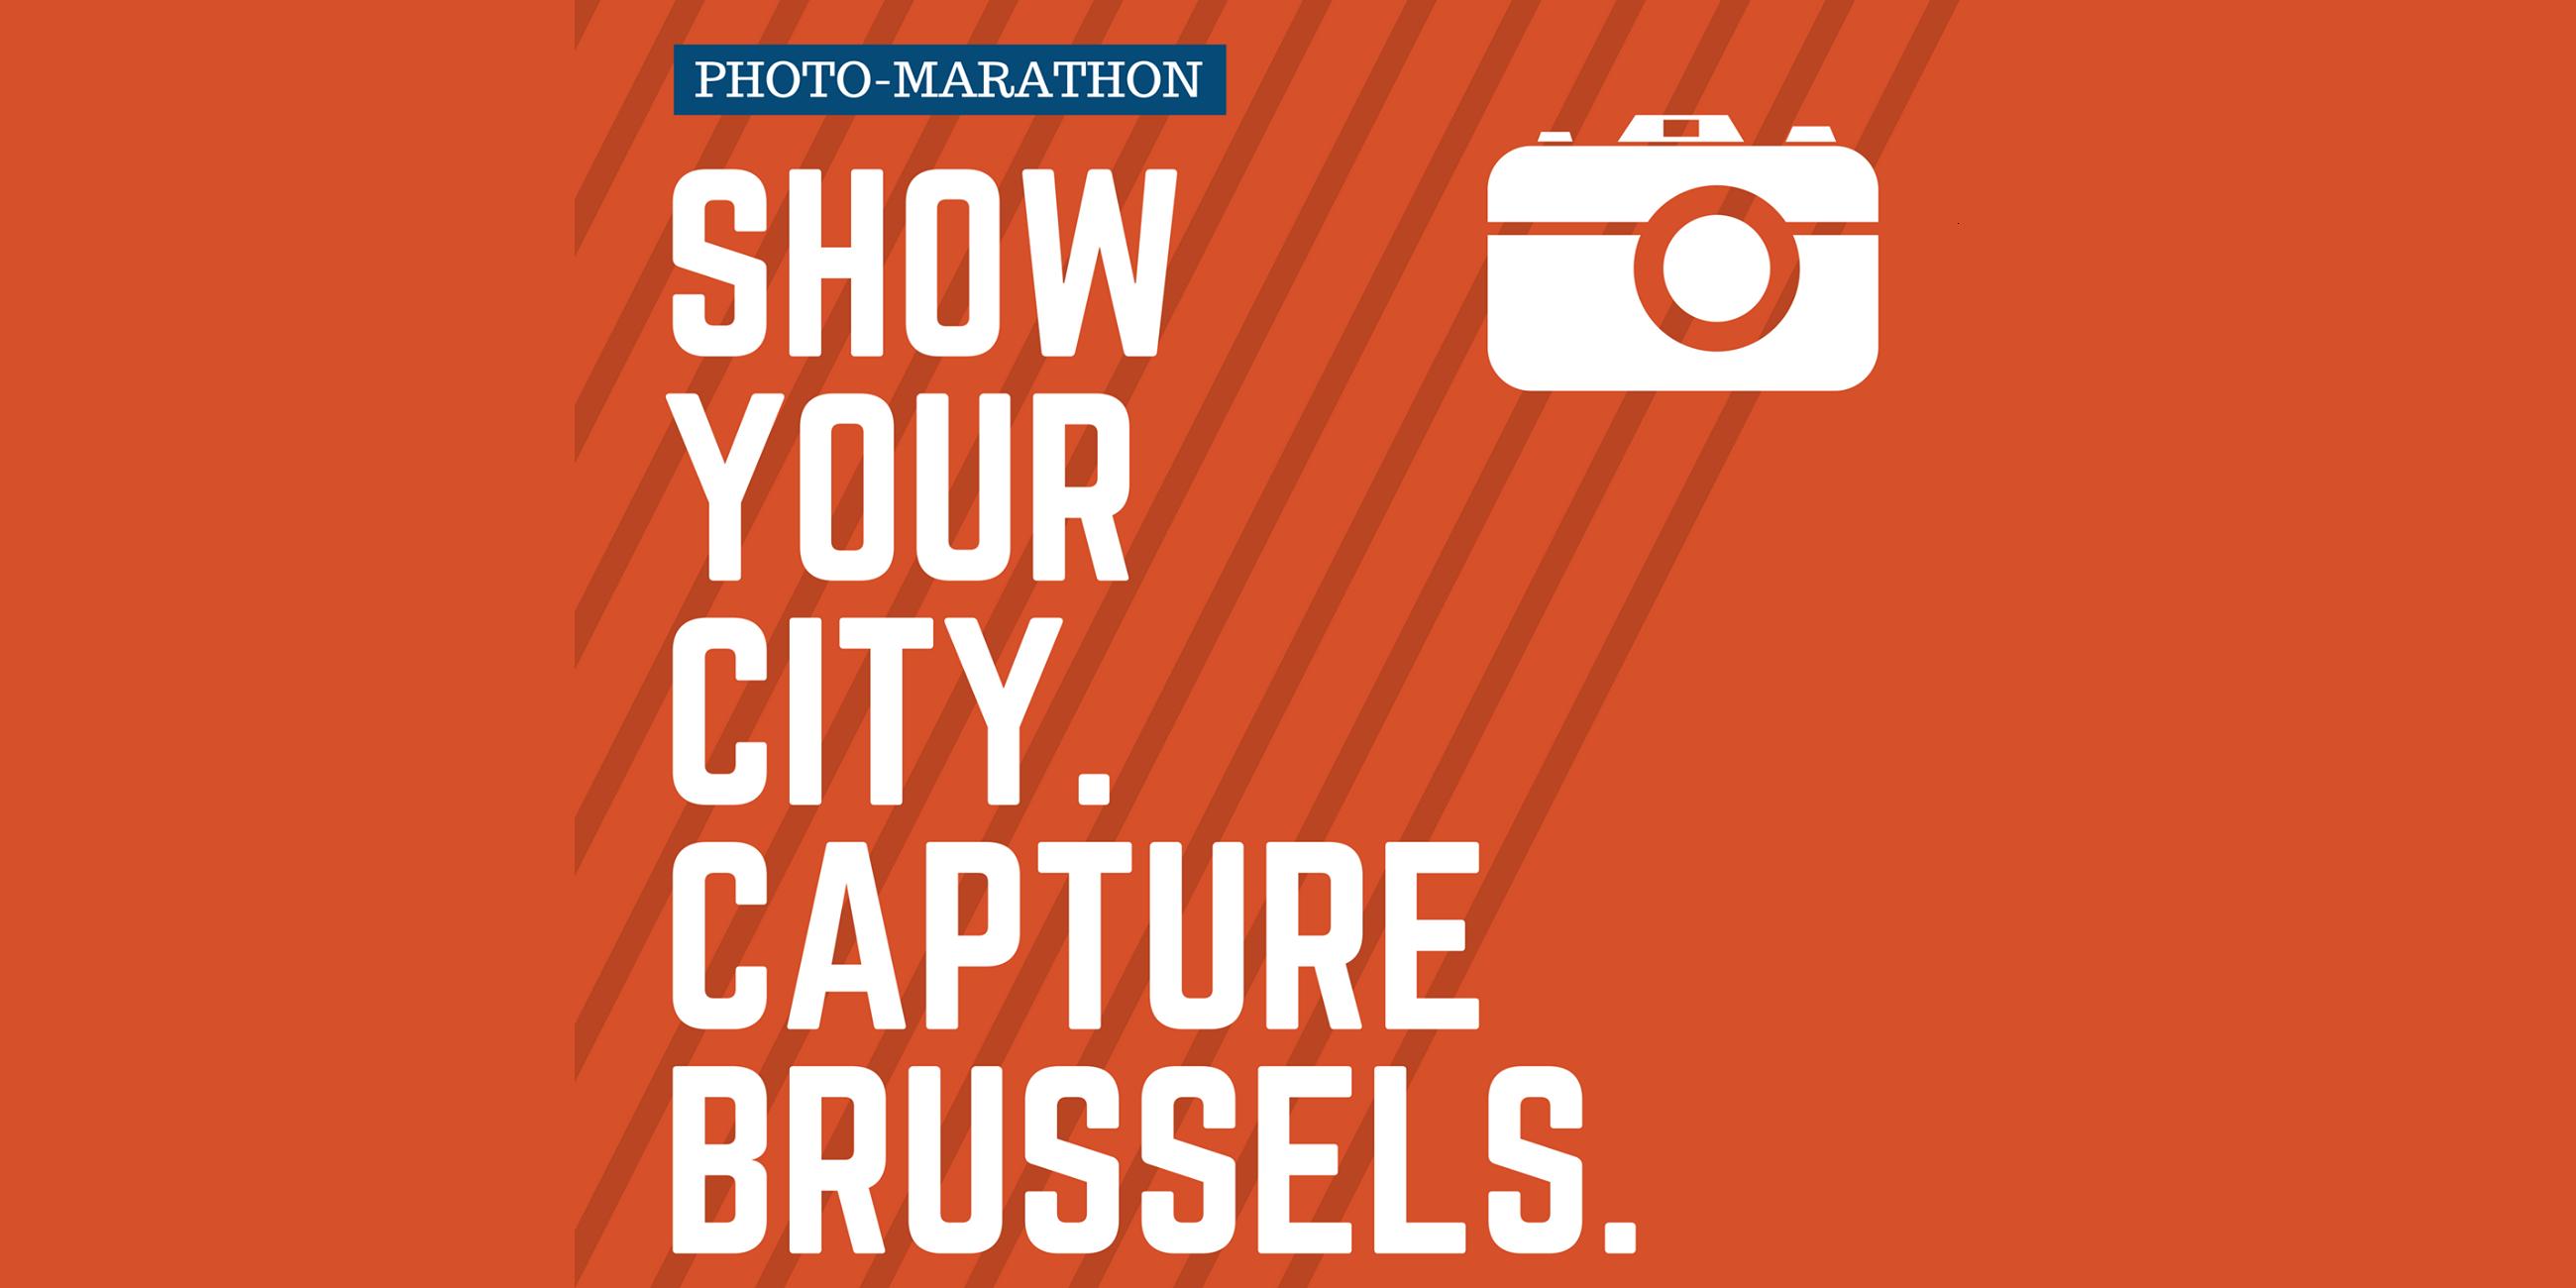 Fotomarathon Capture Brussels